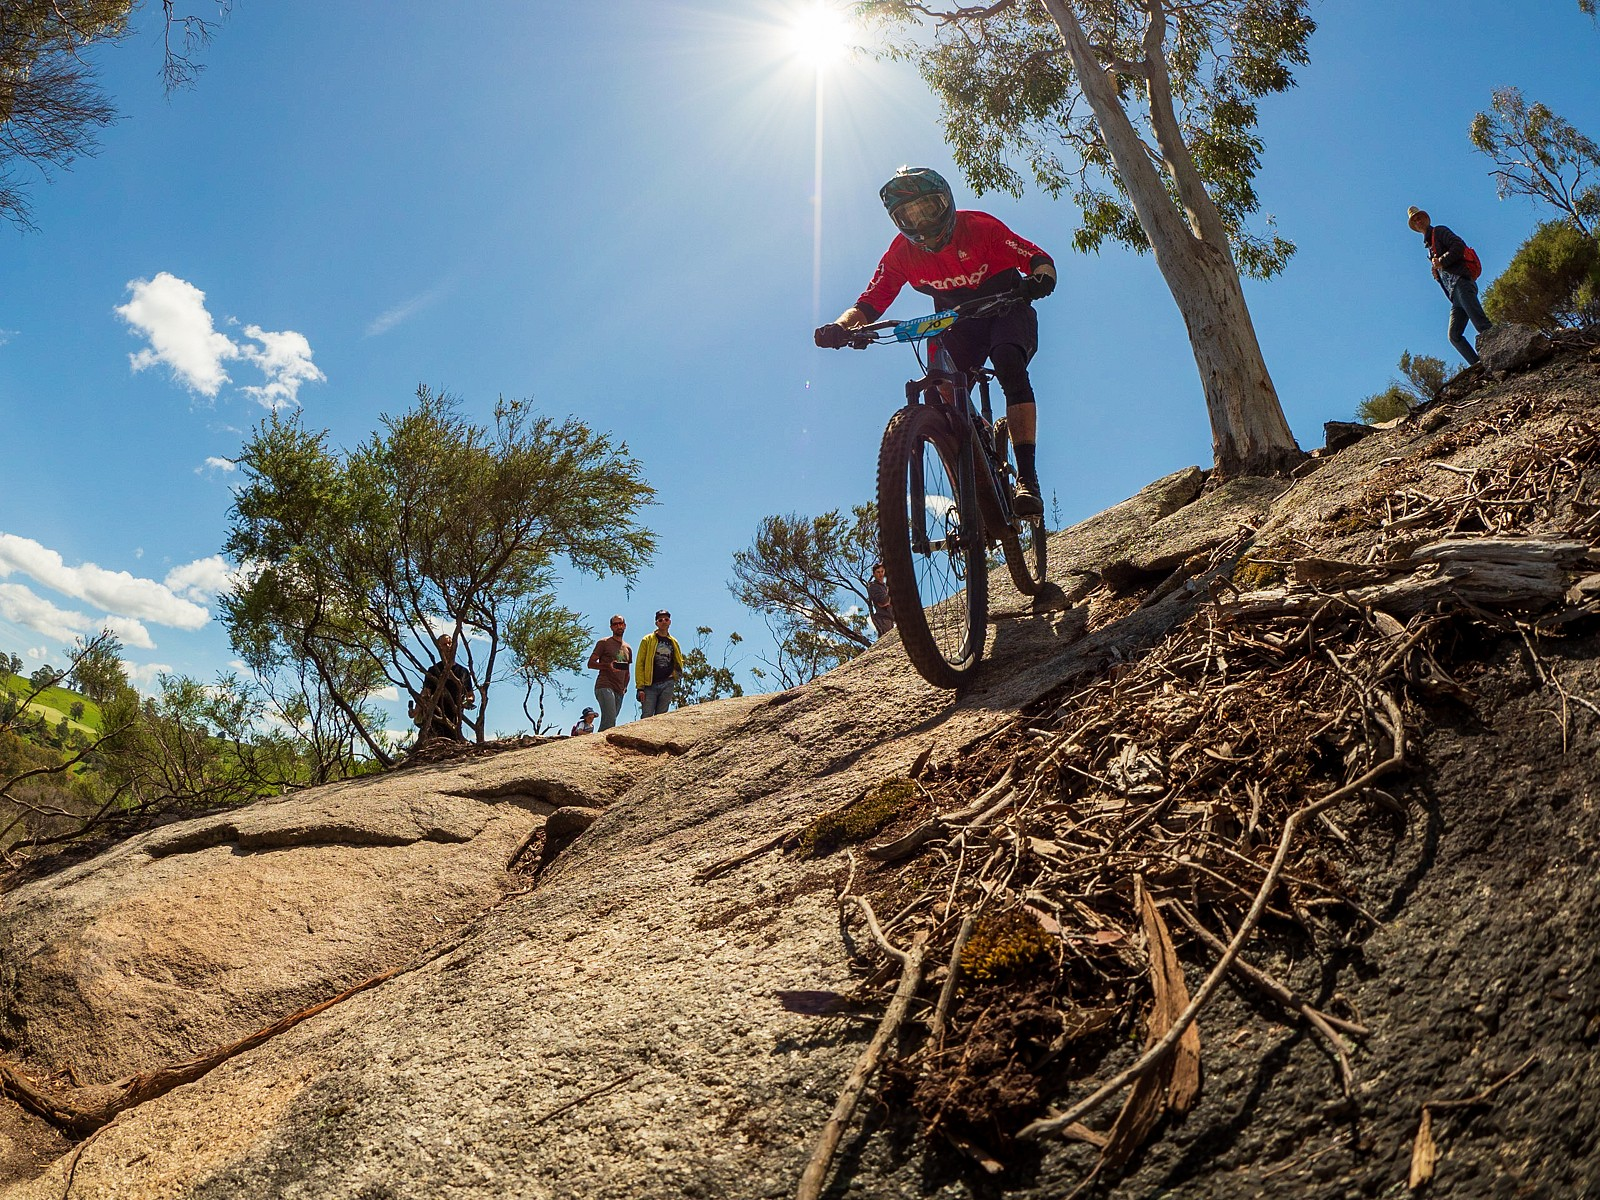 171119-Tassie-0032 - jack.fletcher86 - Mountain Biking Pictures - Vital MTB